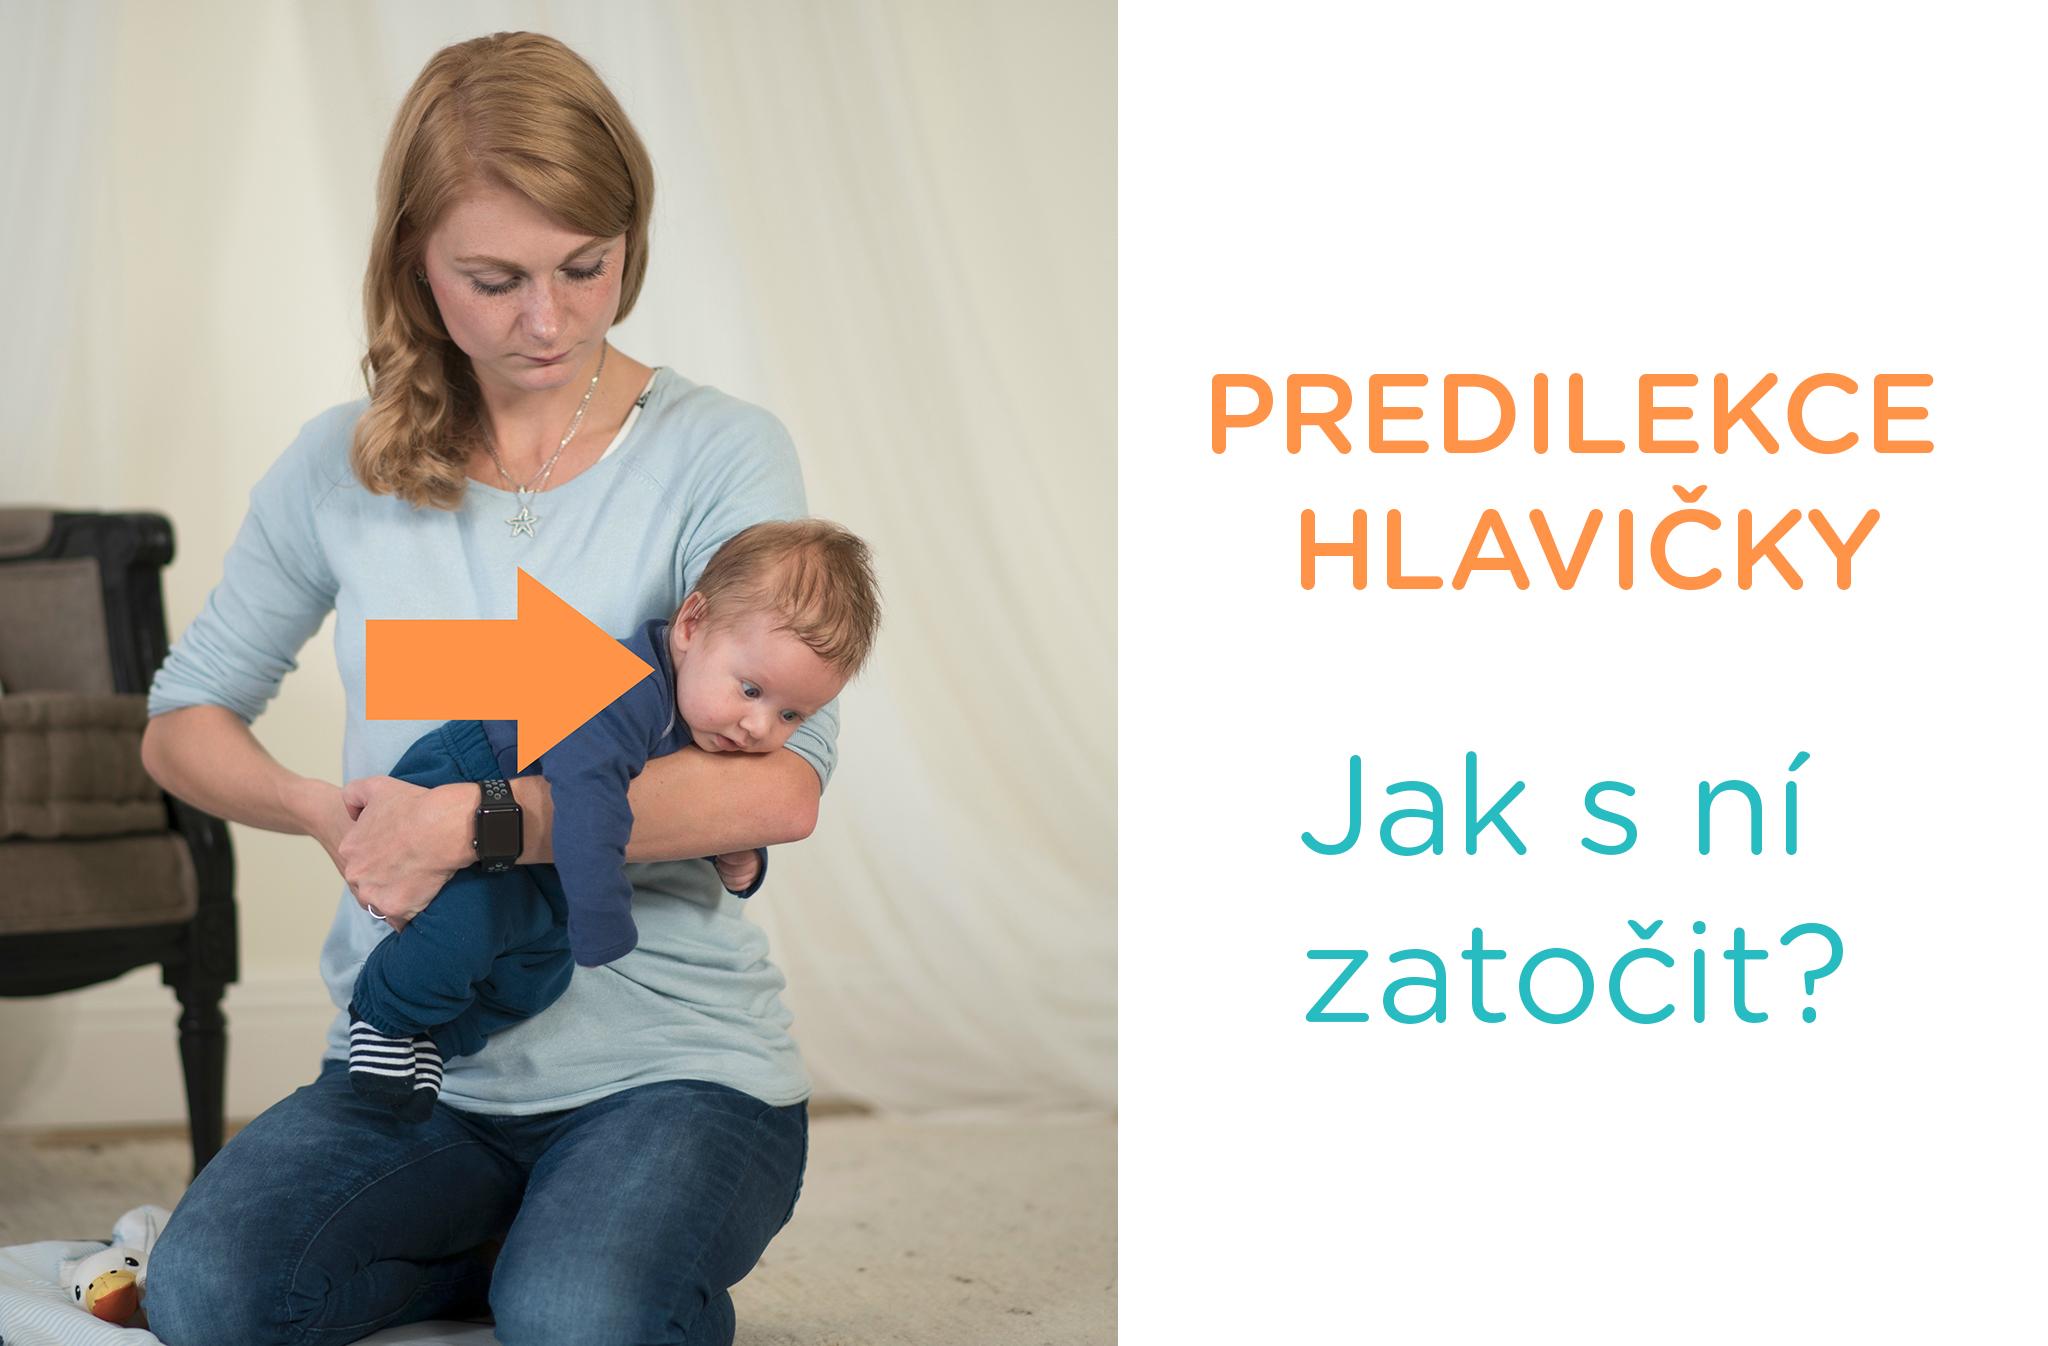 a7724fedf Predilekce hlavičky - jak miminku pomoci i bez rehabilitace - Vanda S.